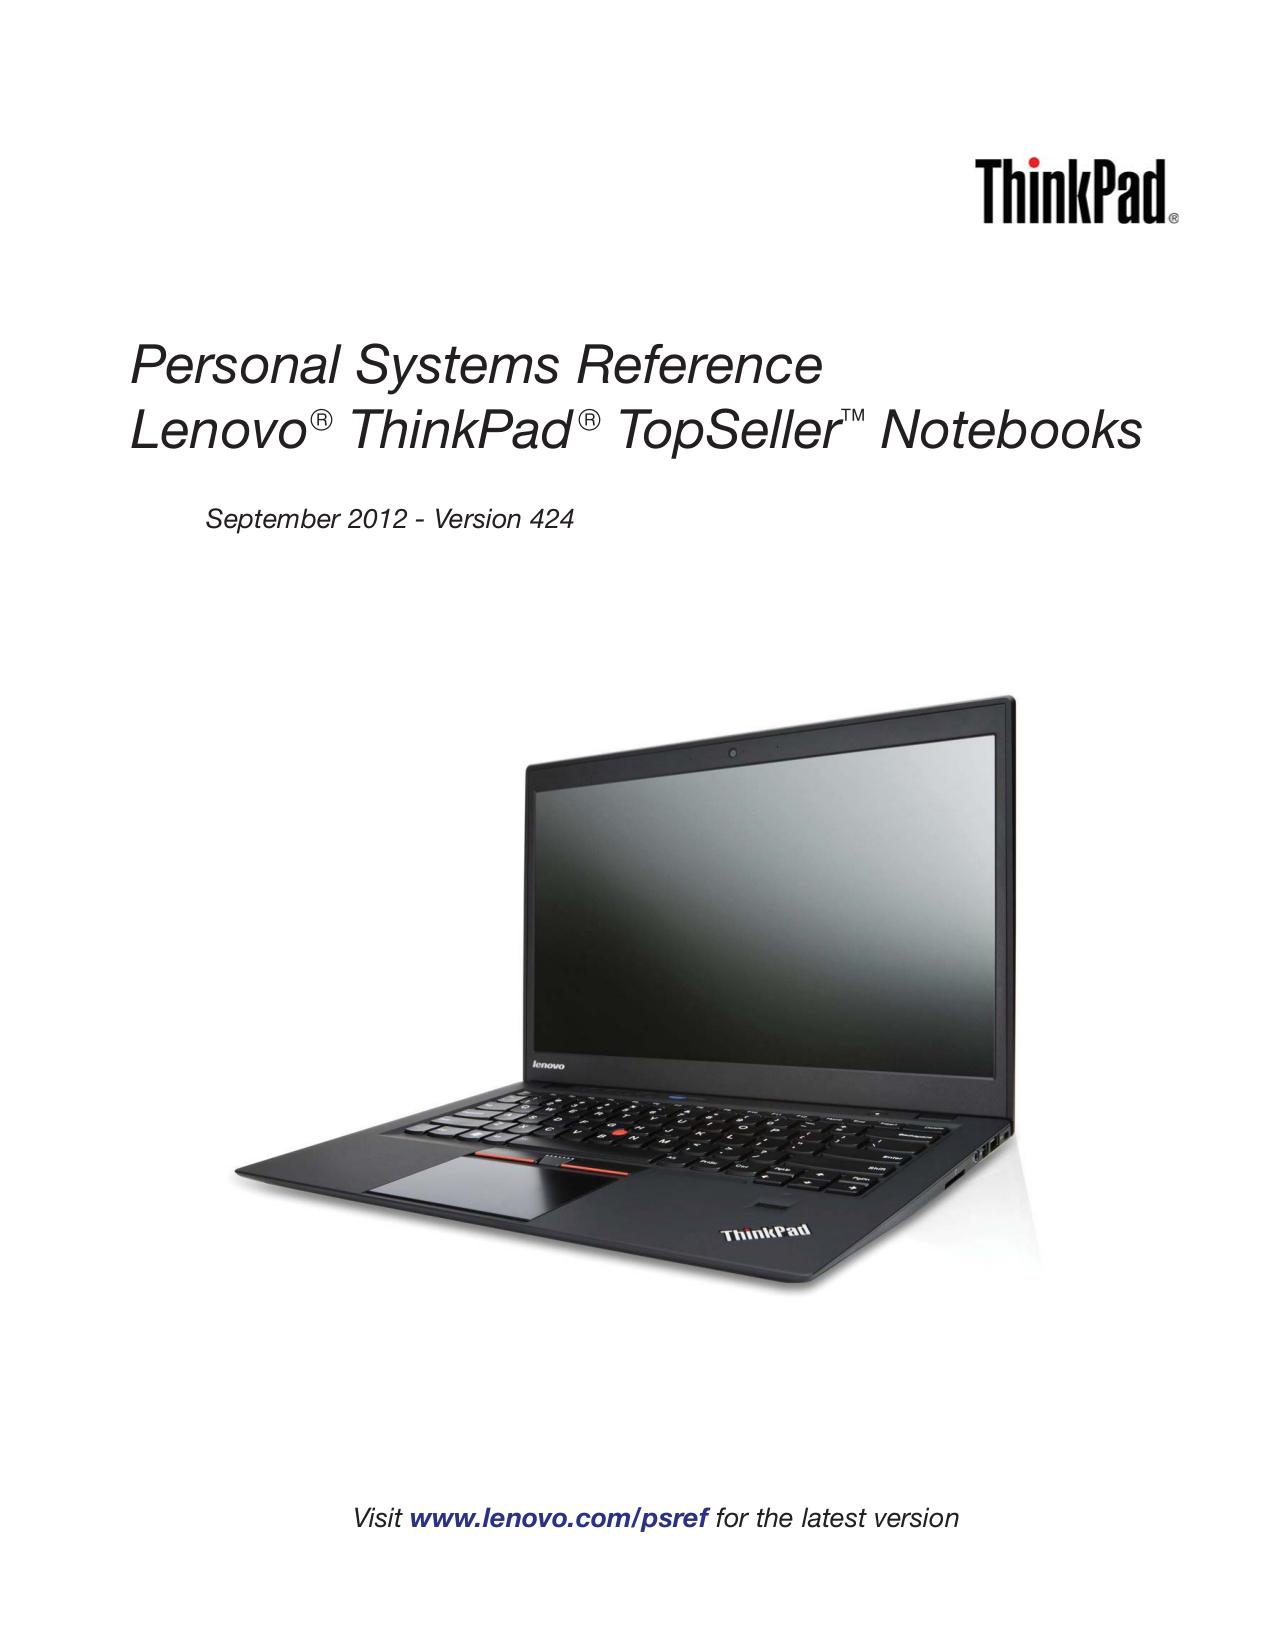 pdf for Lenovo Desktop ThinkCentre M71e 3134 SFF manual